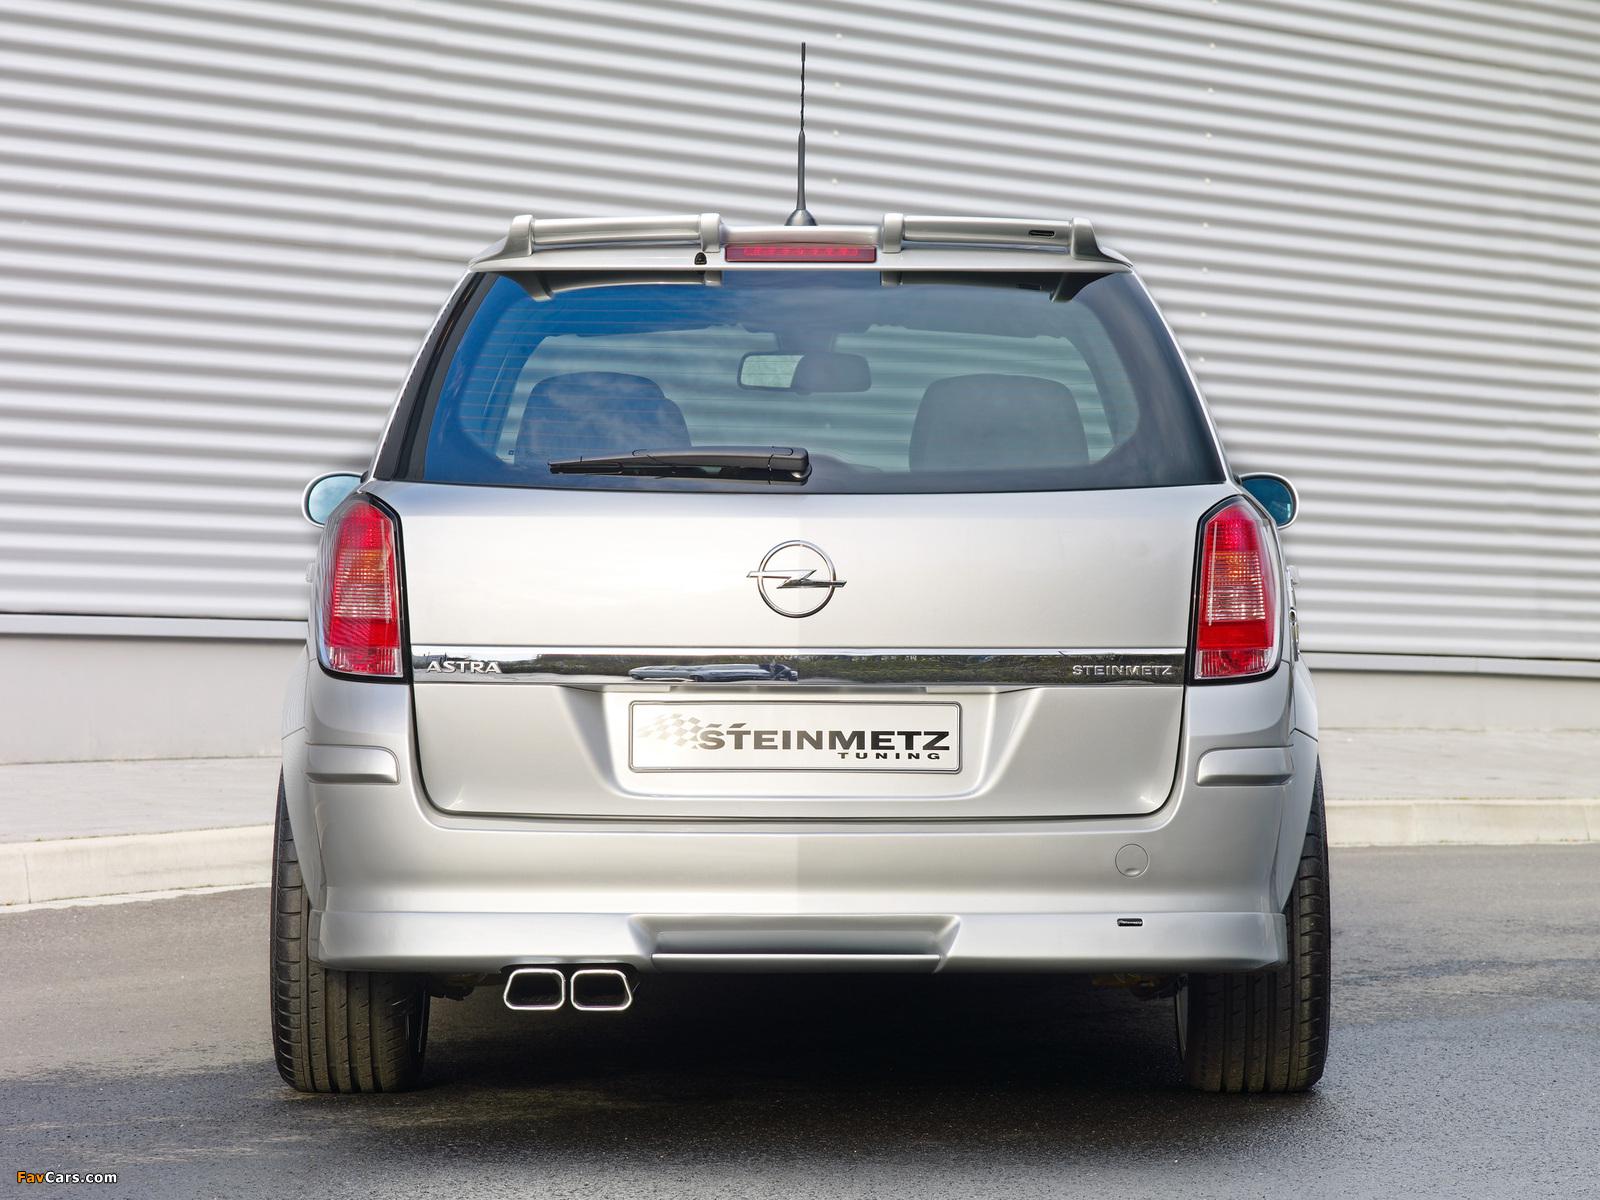 Steinmetz Opel Astra Caravan (H) 2007 images (1600 x 1200)